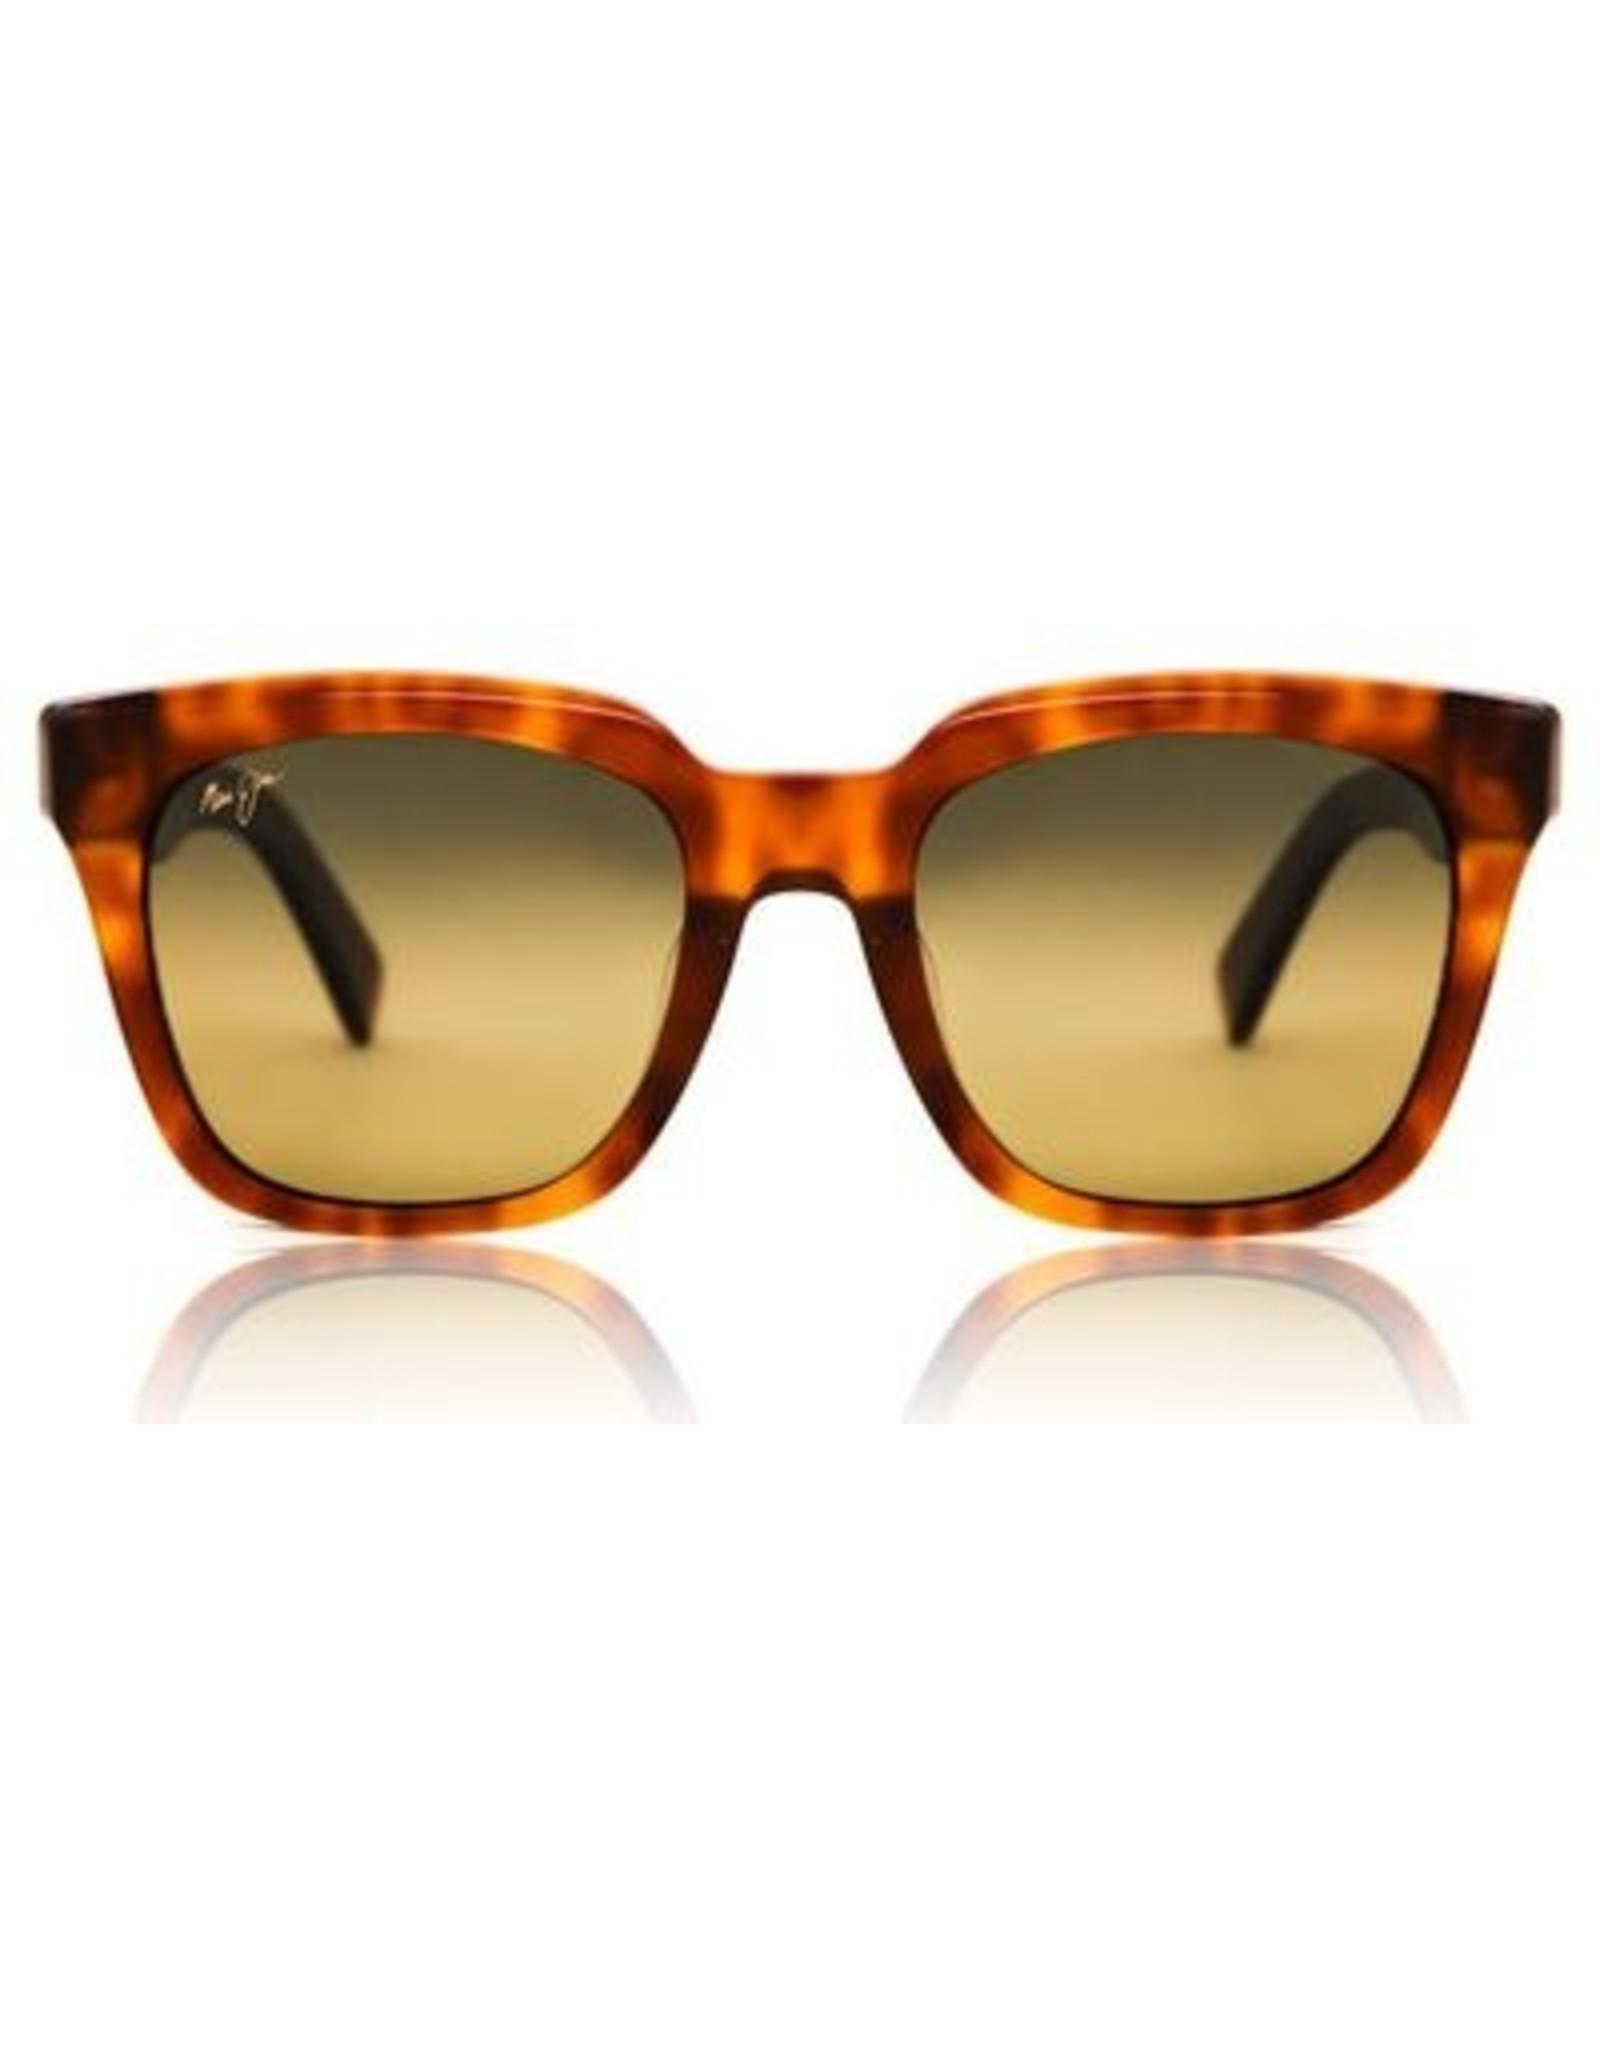 Maui Jim Maui Jim 'Heliconia' Sunglasses